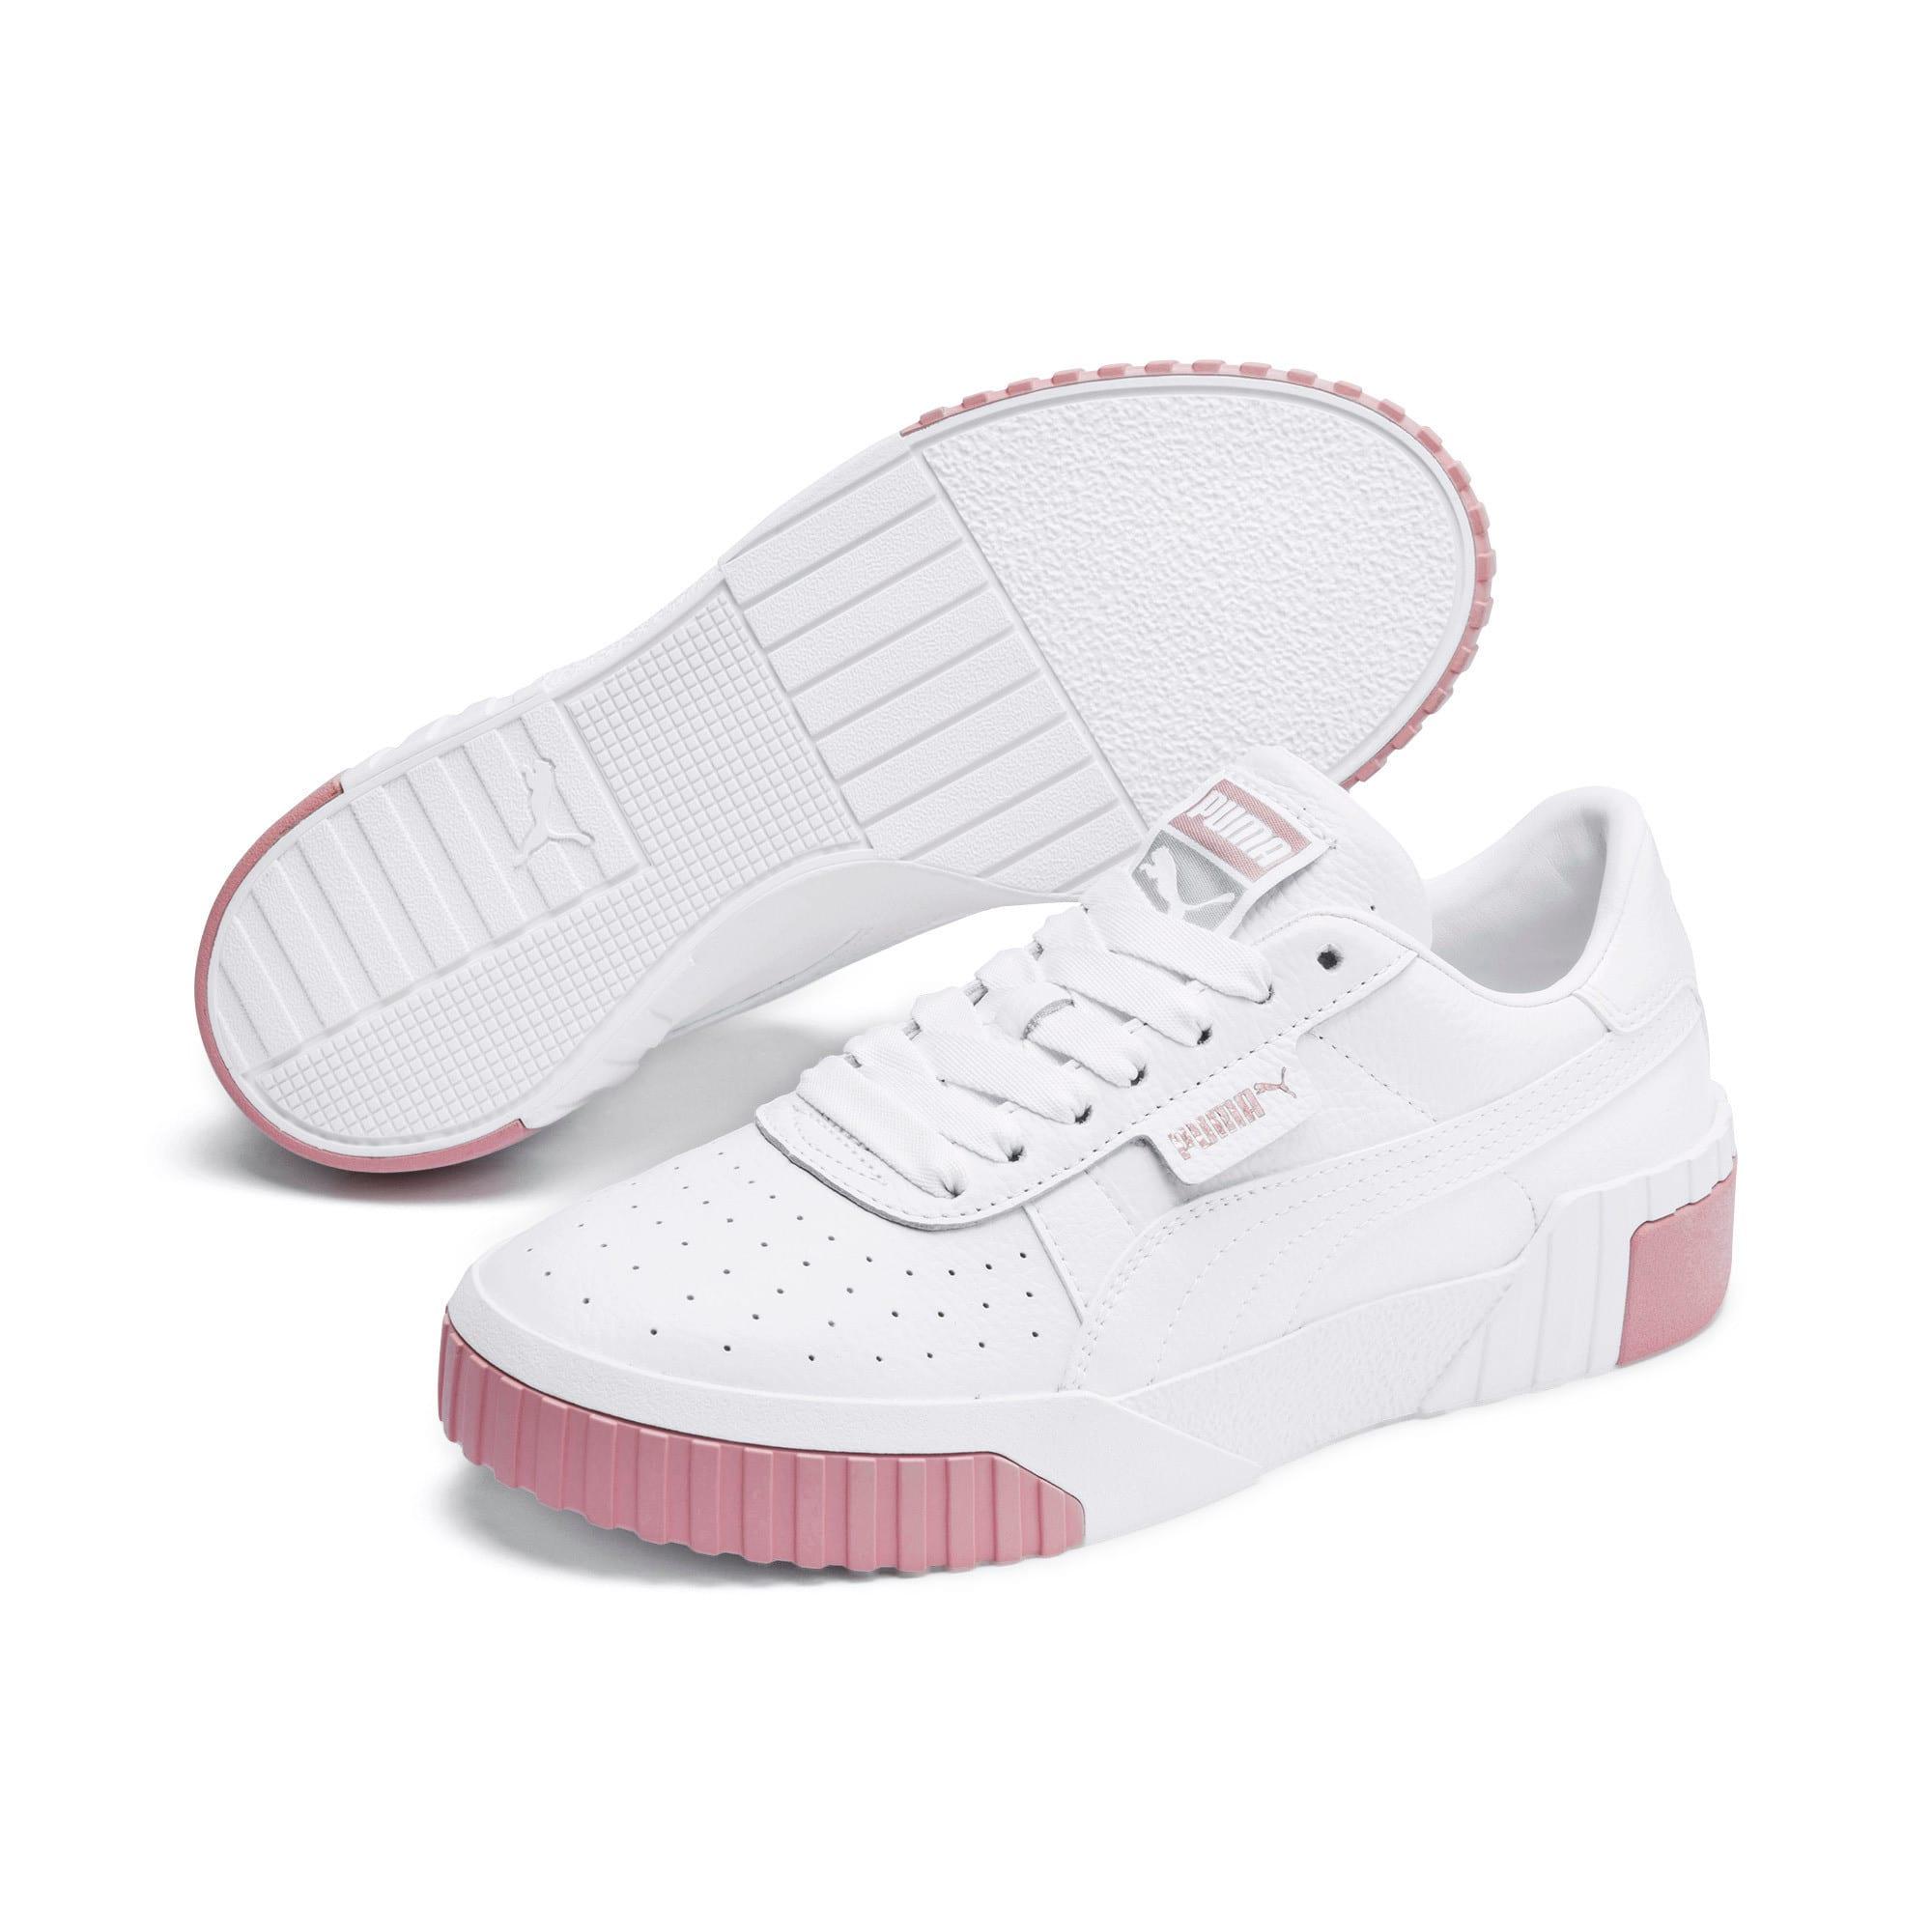 Thumbnail 3 of Cali Women's Sneakers, Puma White-Rose Gold, medium